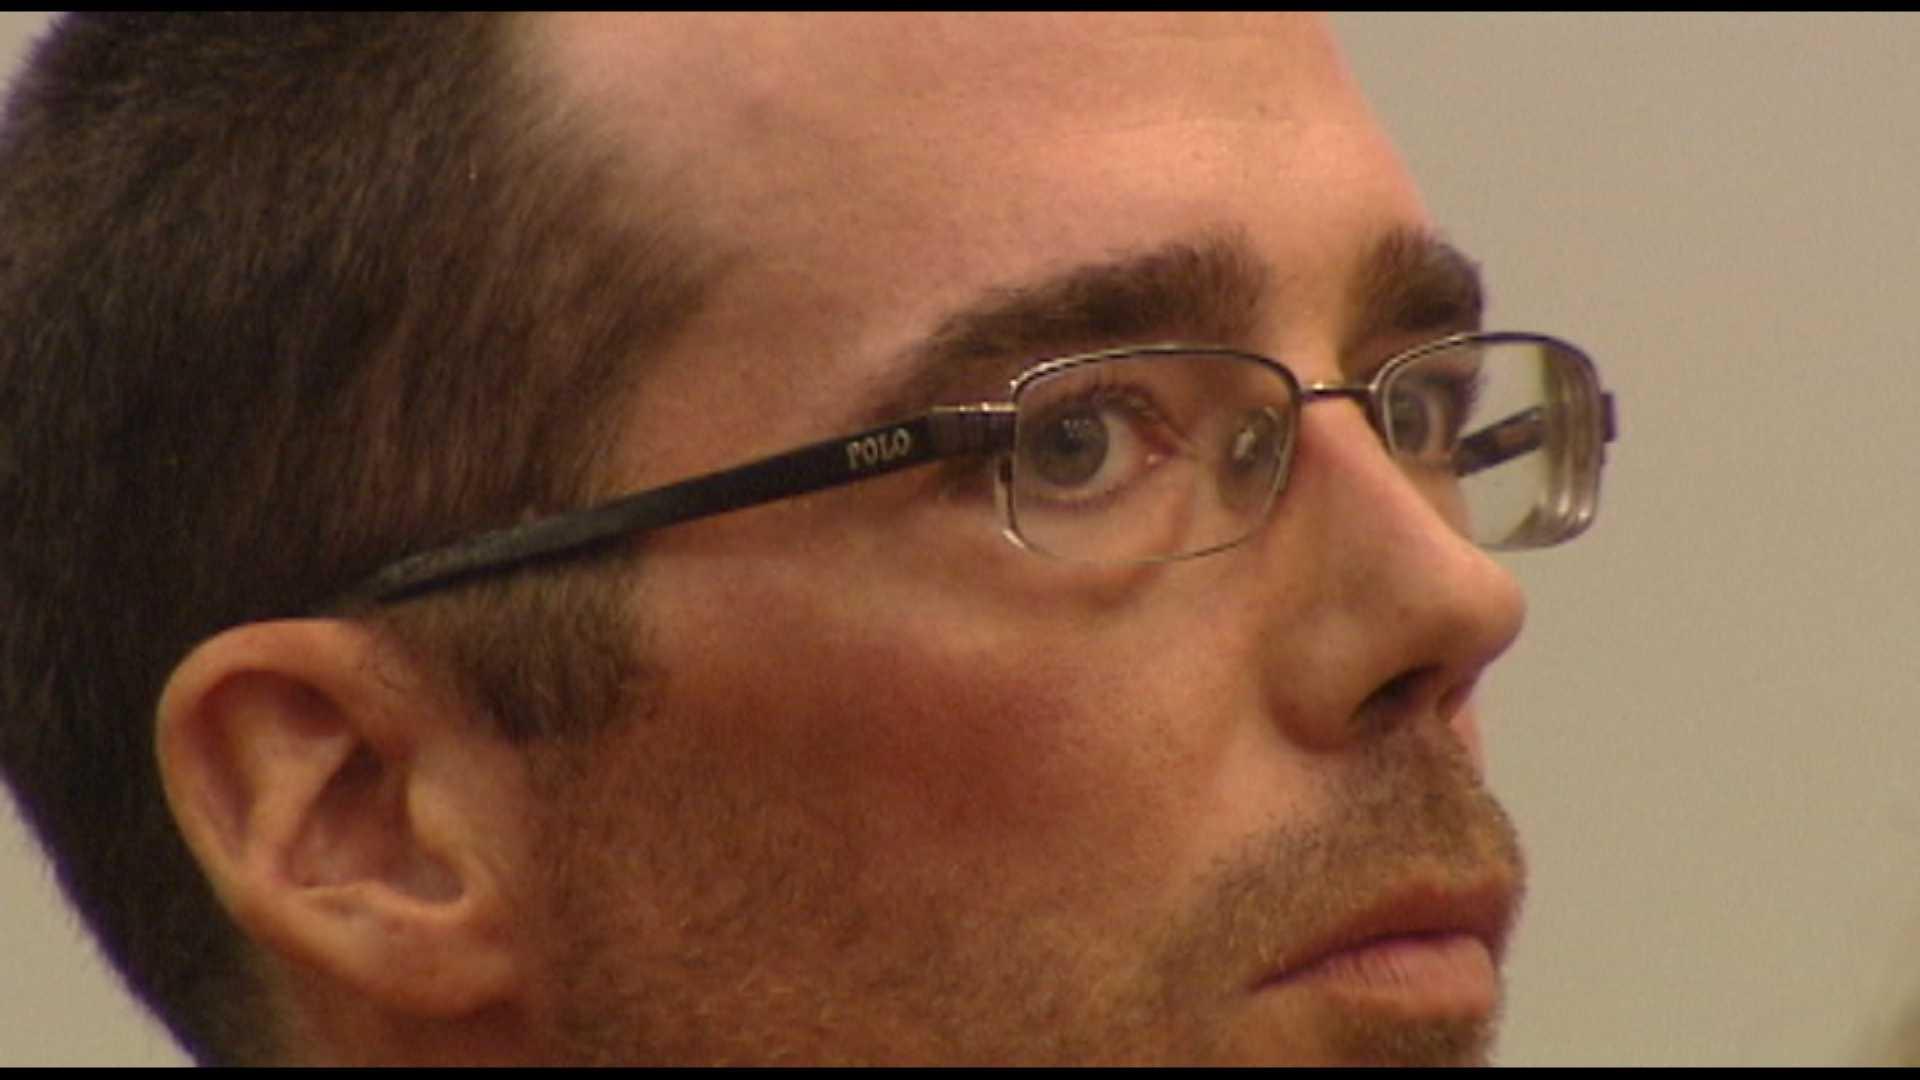 A Pittsford man denies he killed his girlfriend in a domestic dispute.